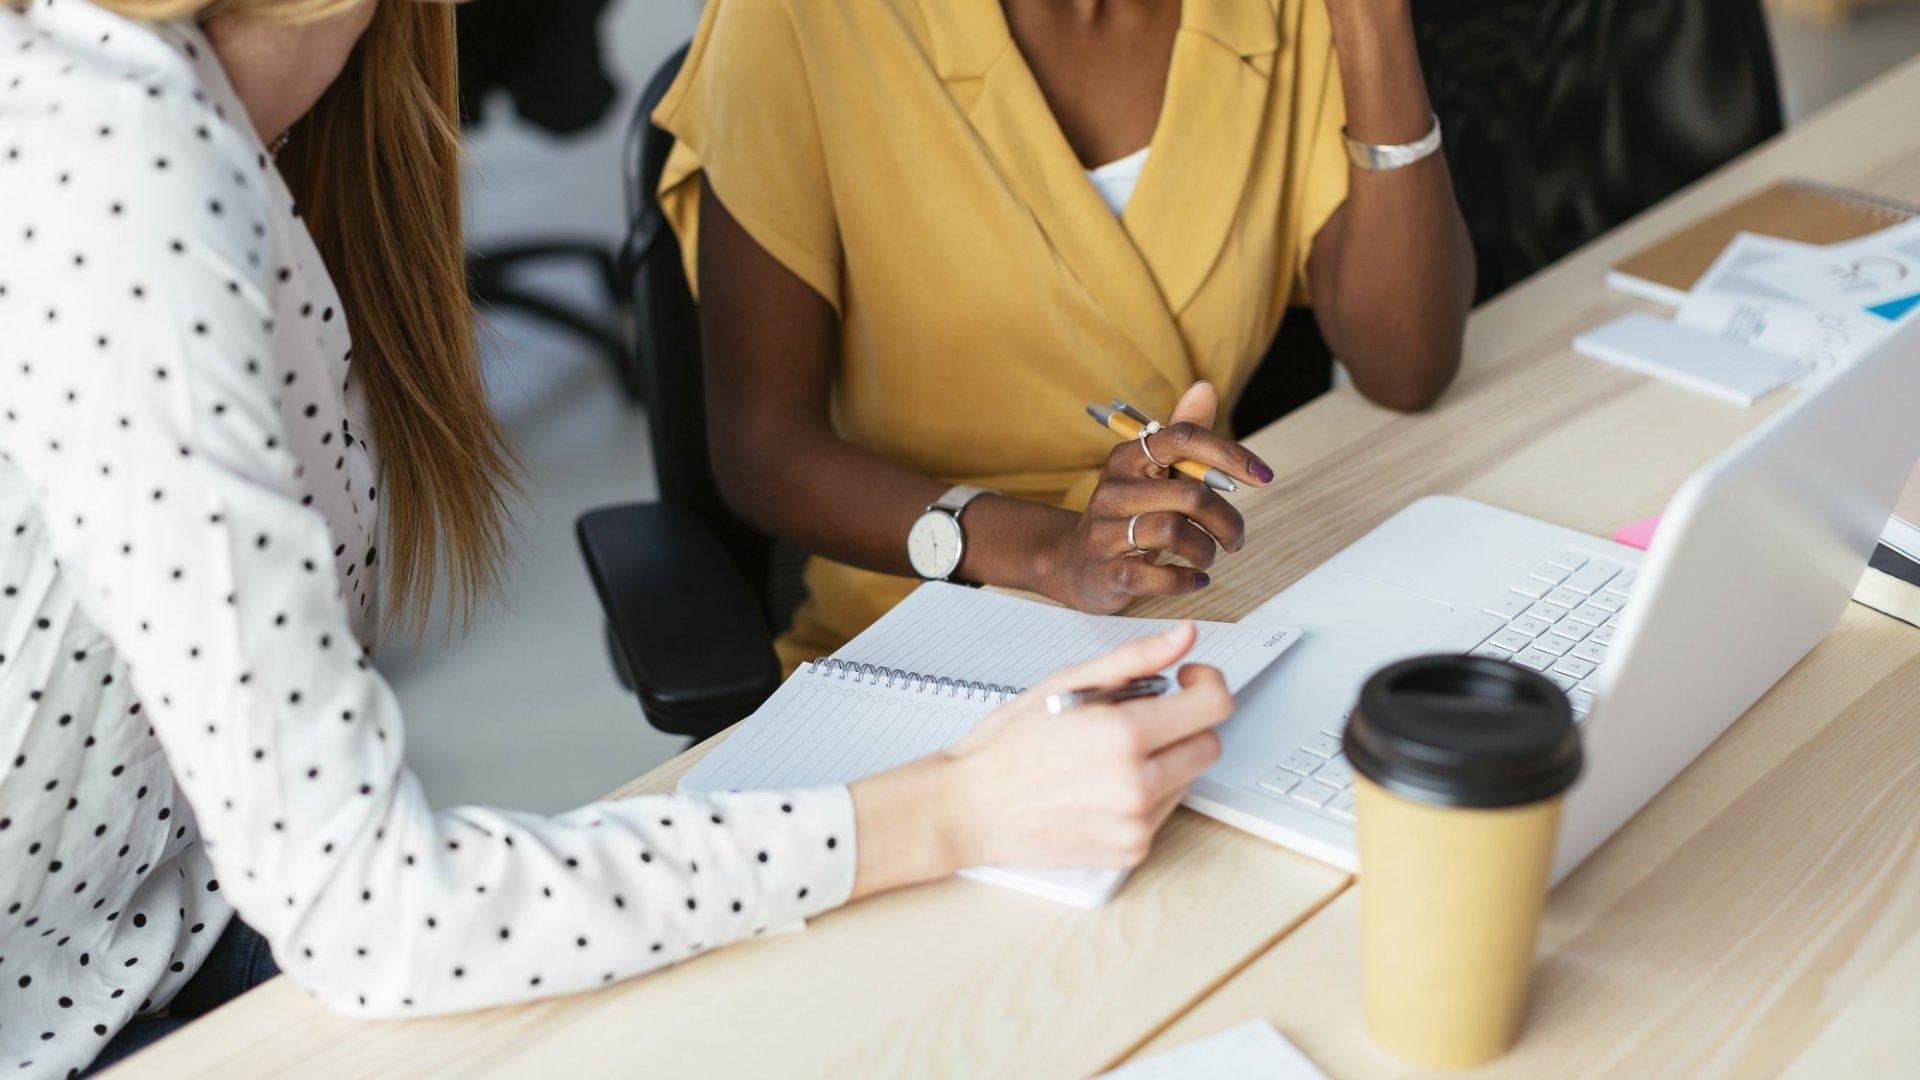 New Study: Female Employees Receive Less Useful Feedback